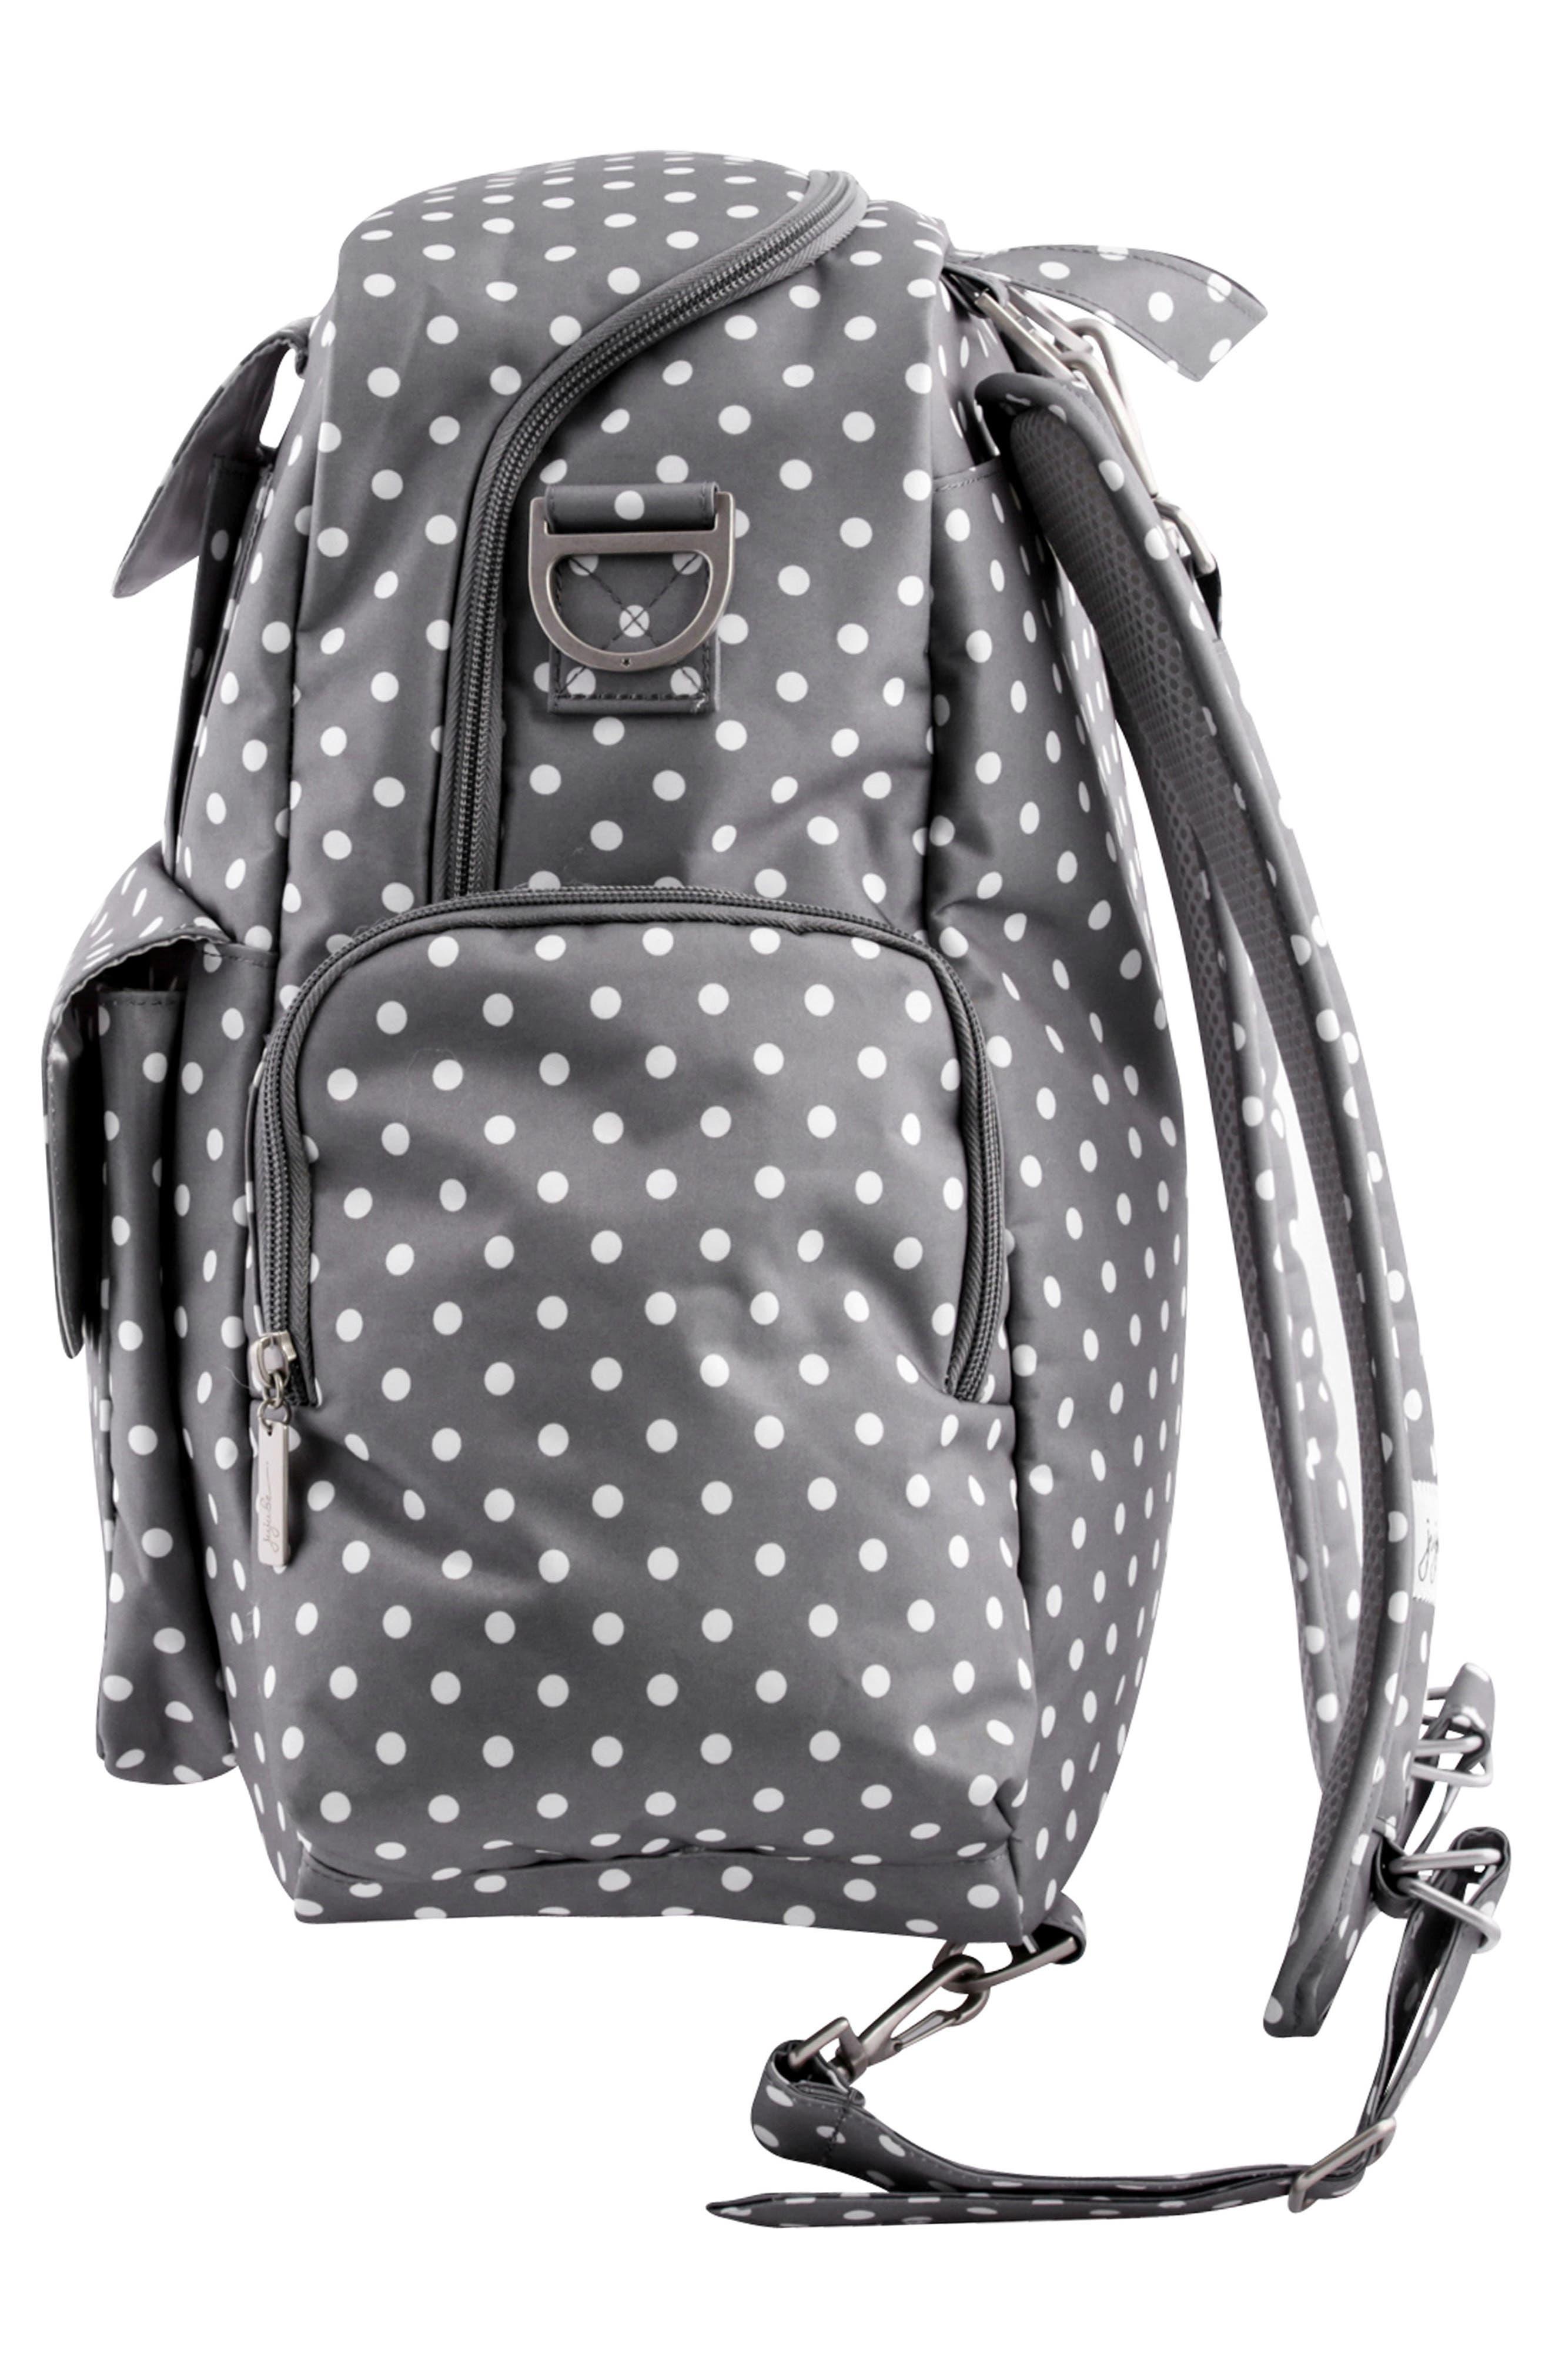 Be Nurtured Pumping Backpack,                             Alternate thumbnail 8, color,                             020